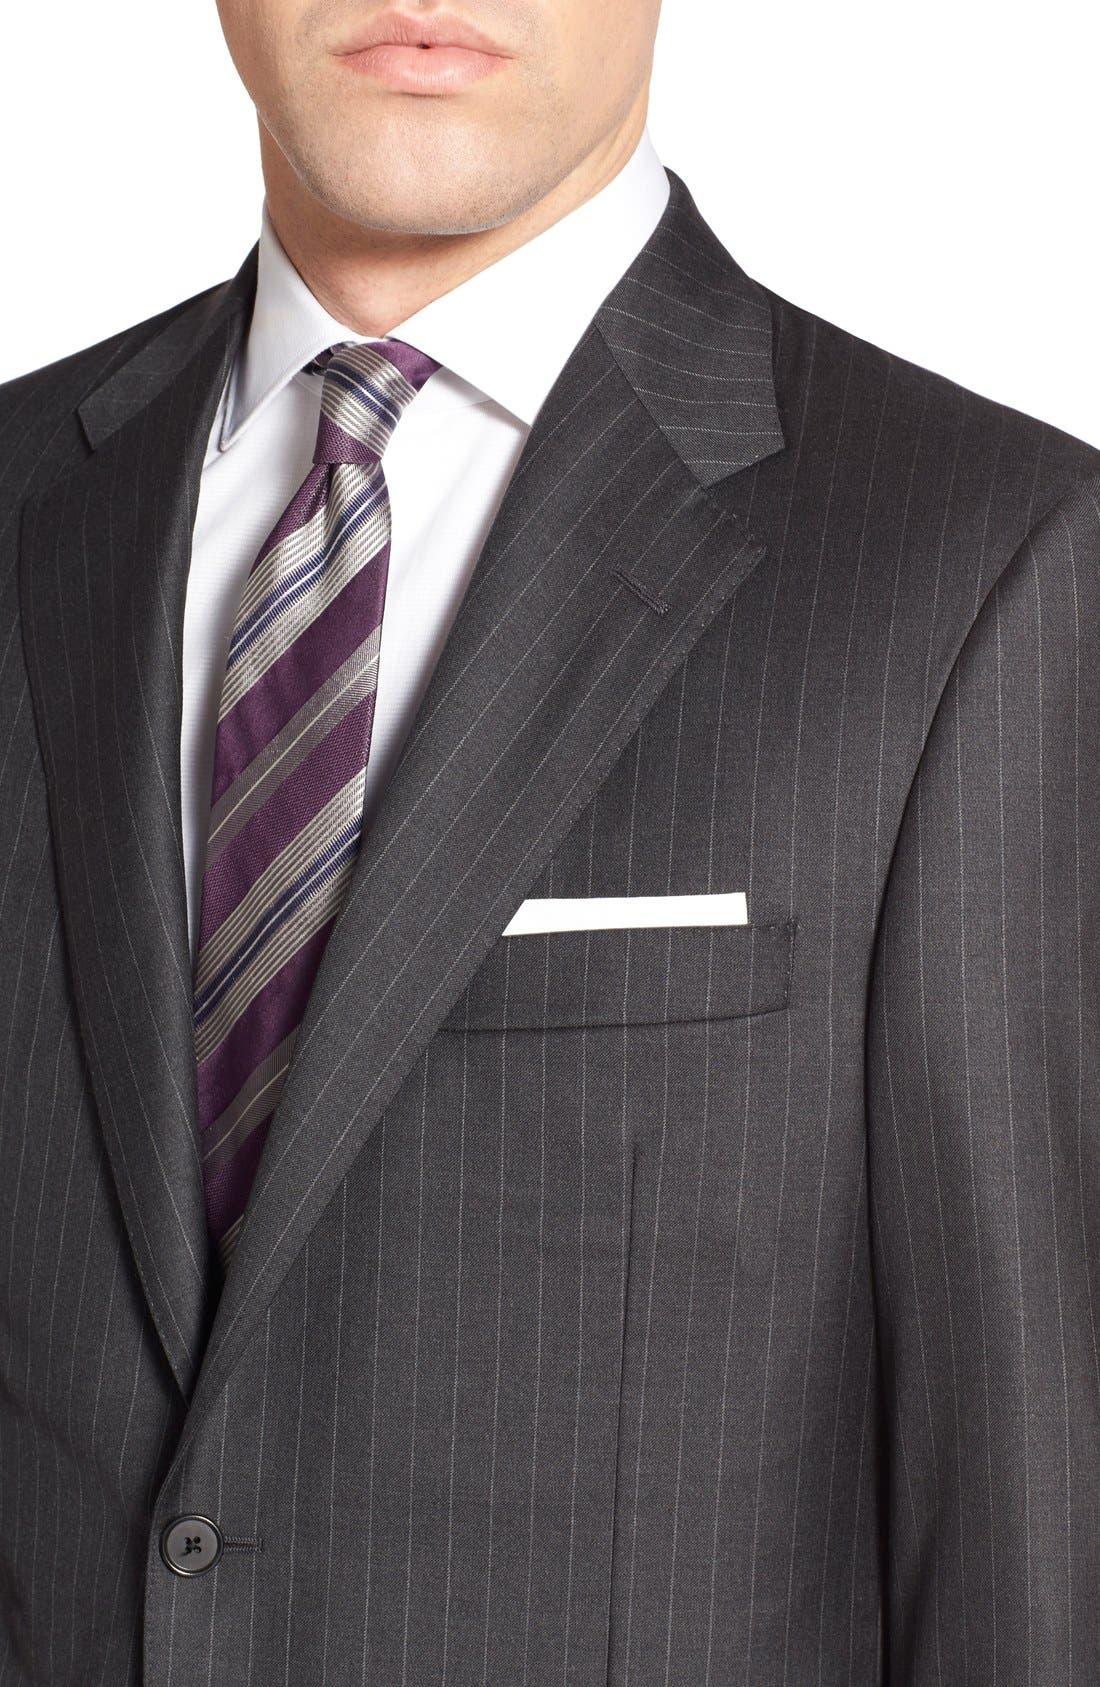 'Addison - A Series' Classic Fit Stripe Wool Suit,                             Alternate thumbnail 5, color,                             031